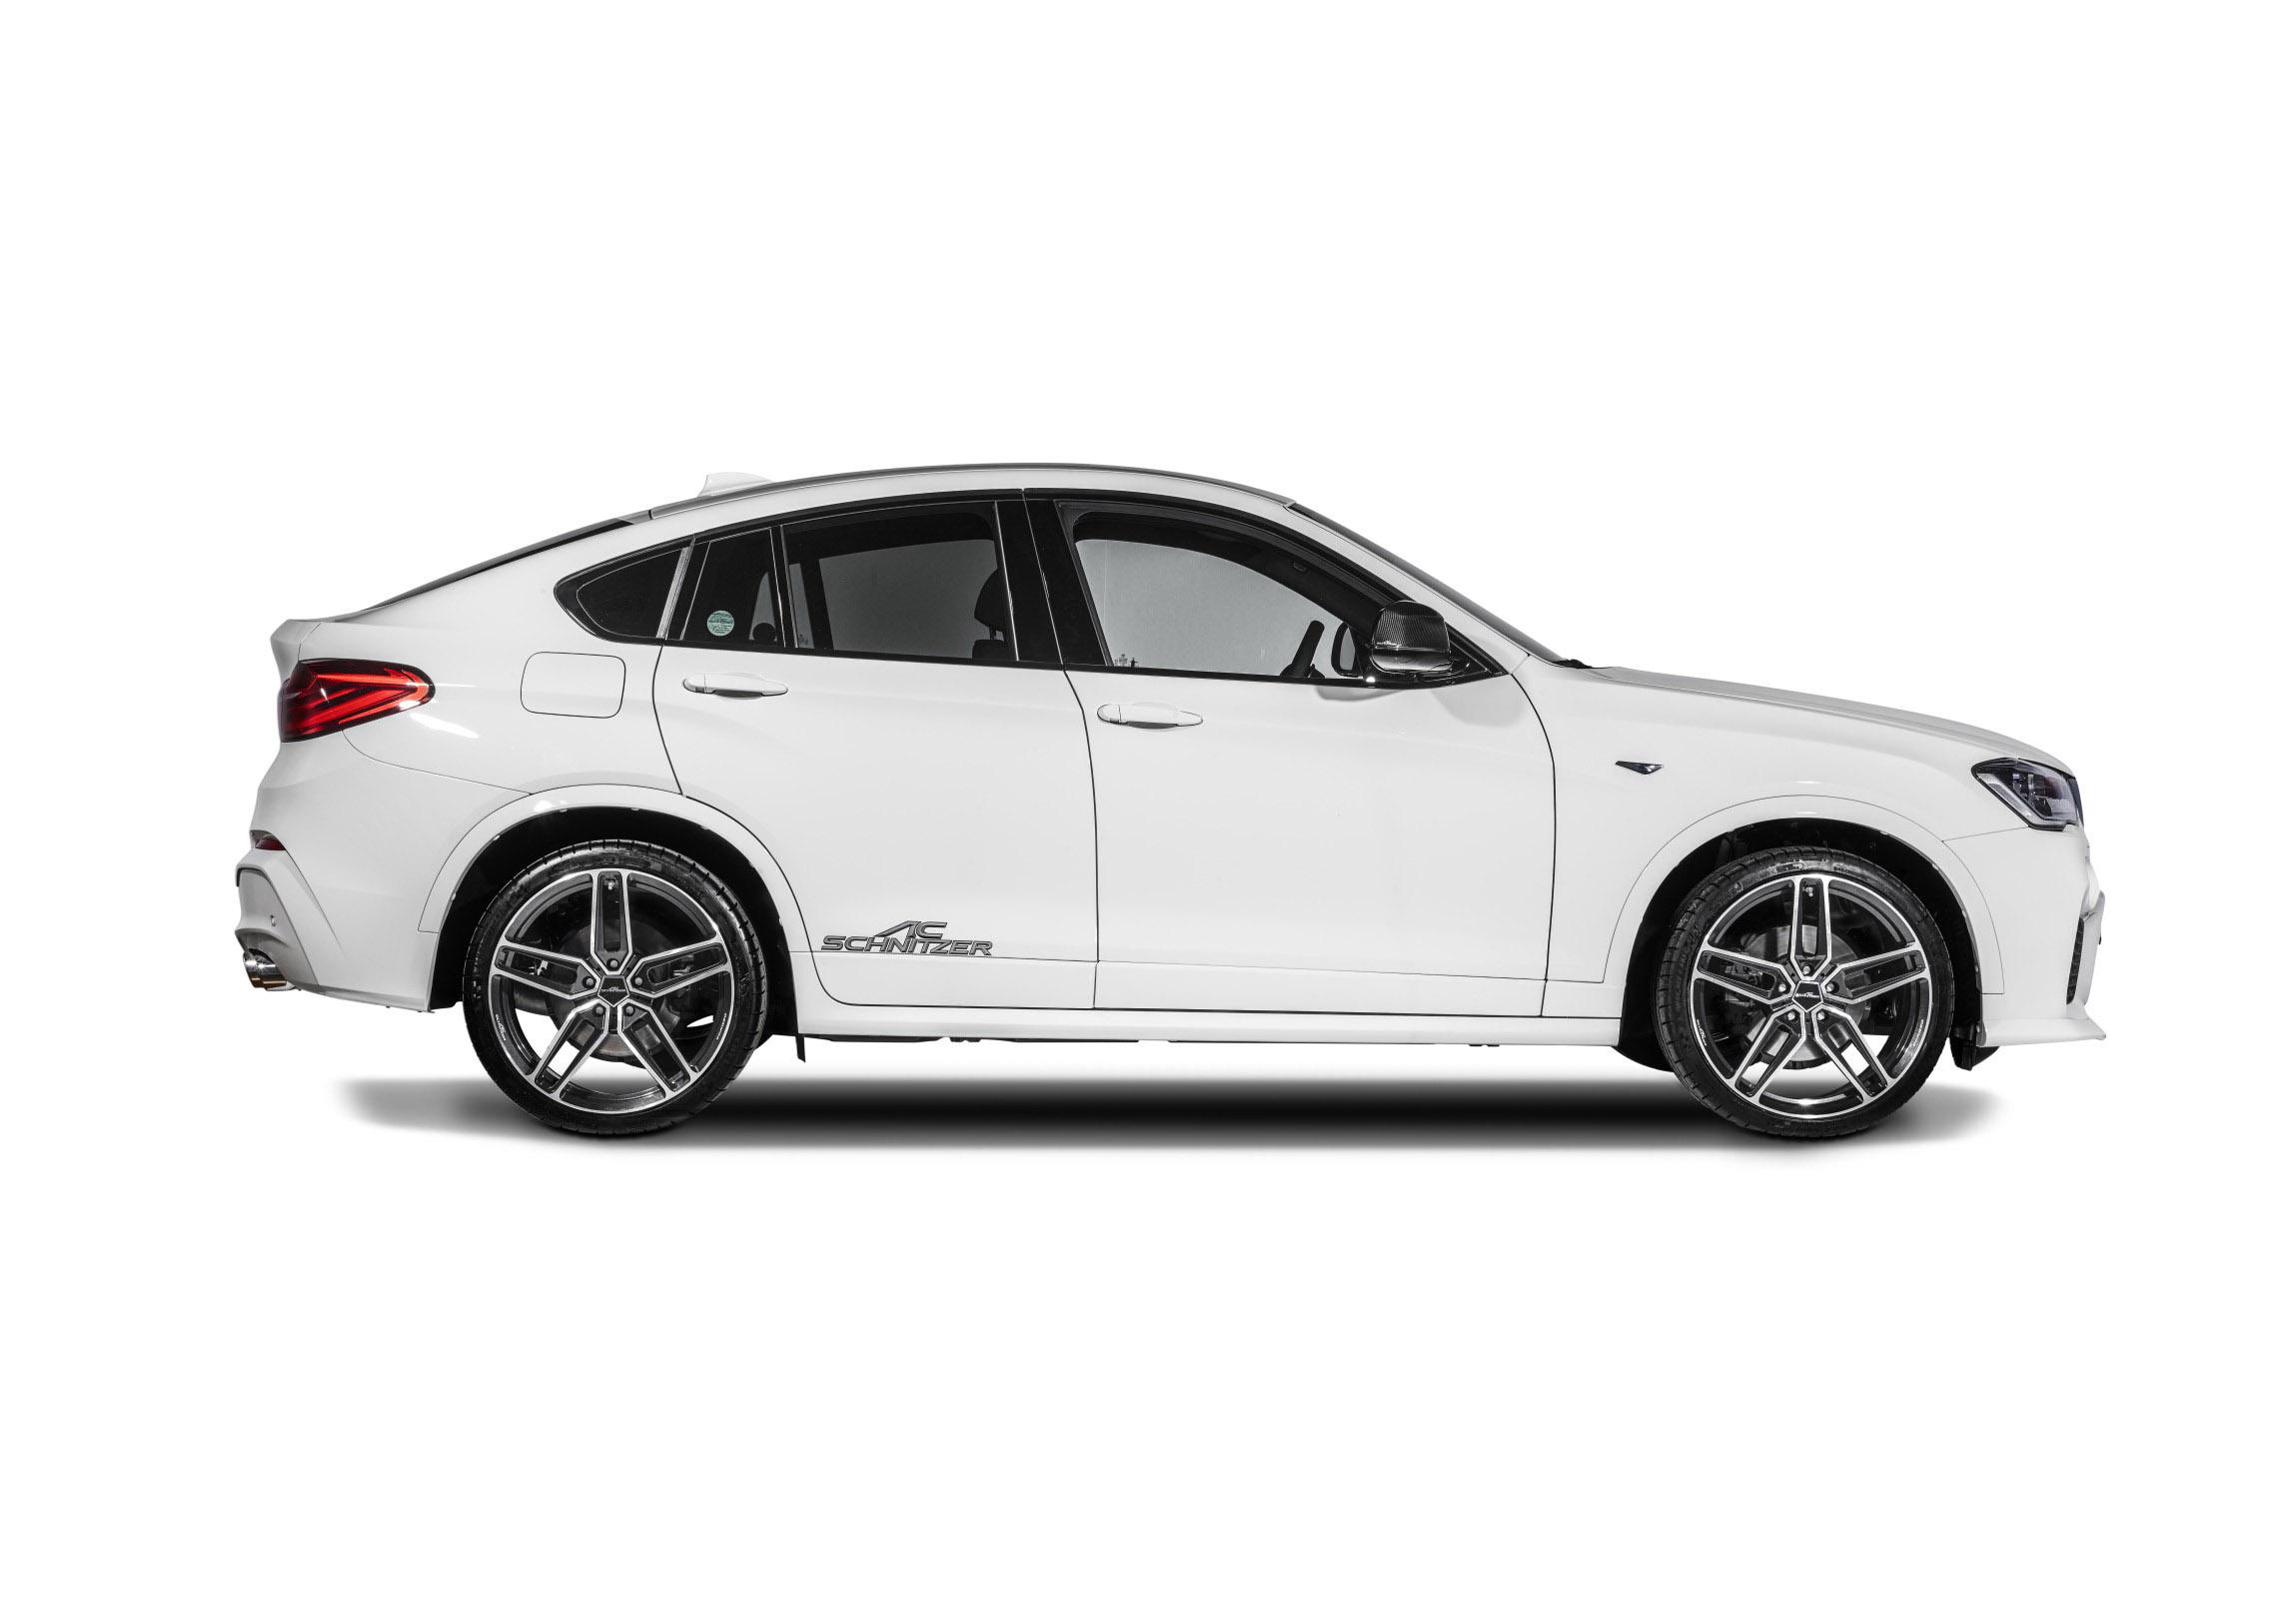 АС Шнитцер представлена на BMW х4 в невероятно спортивная версия - фотография №7